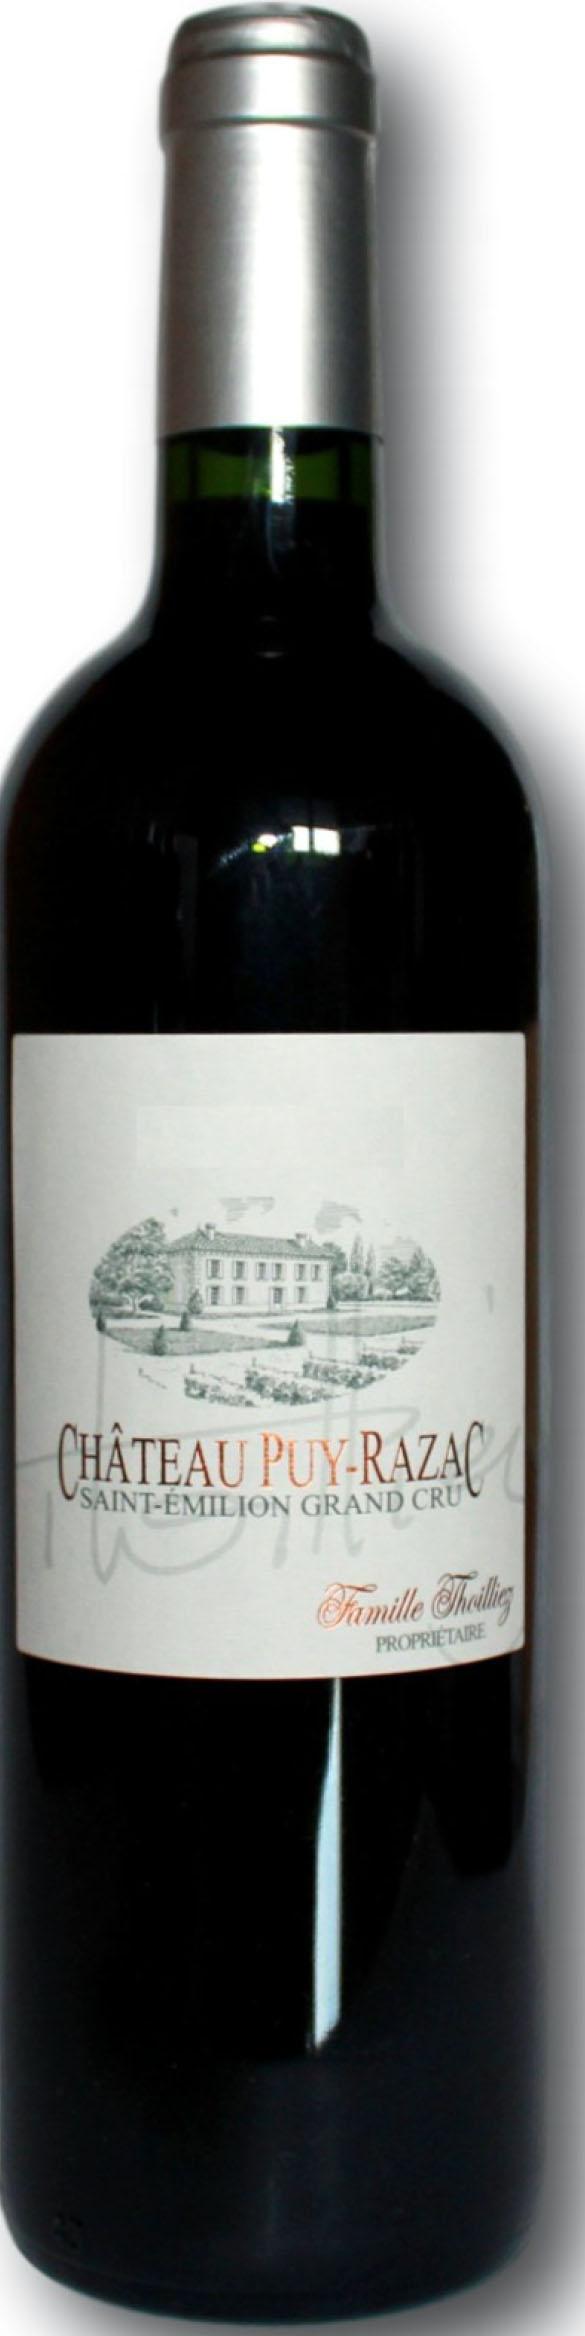 Chateau Puy Razac